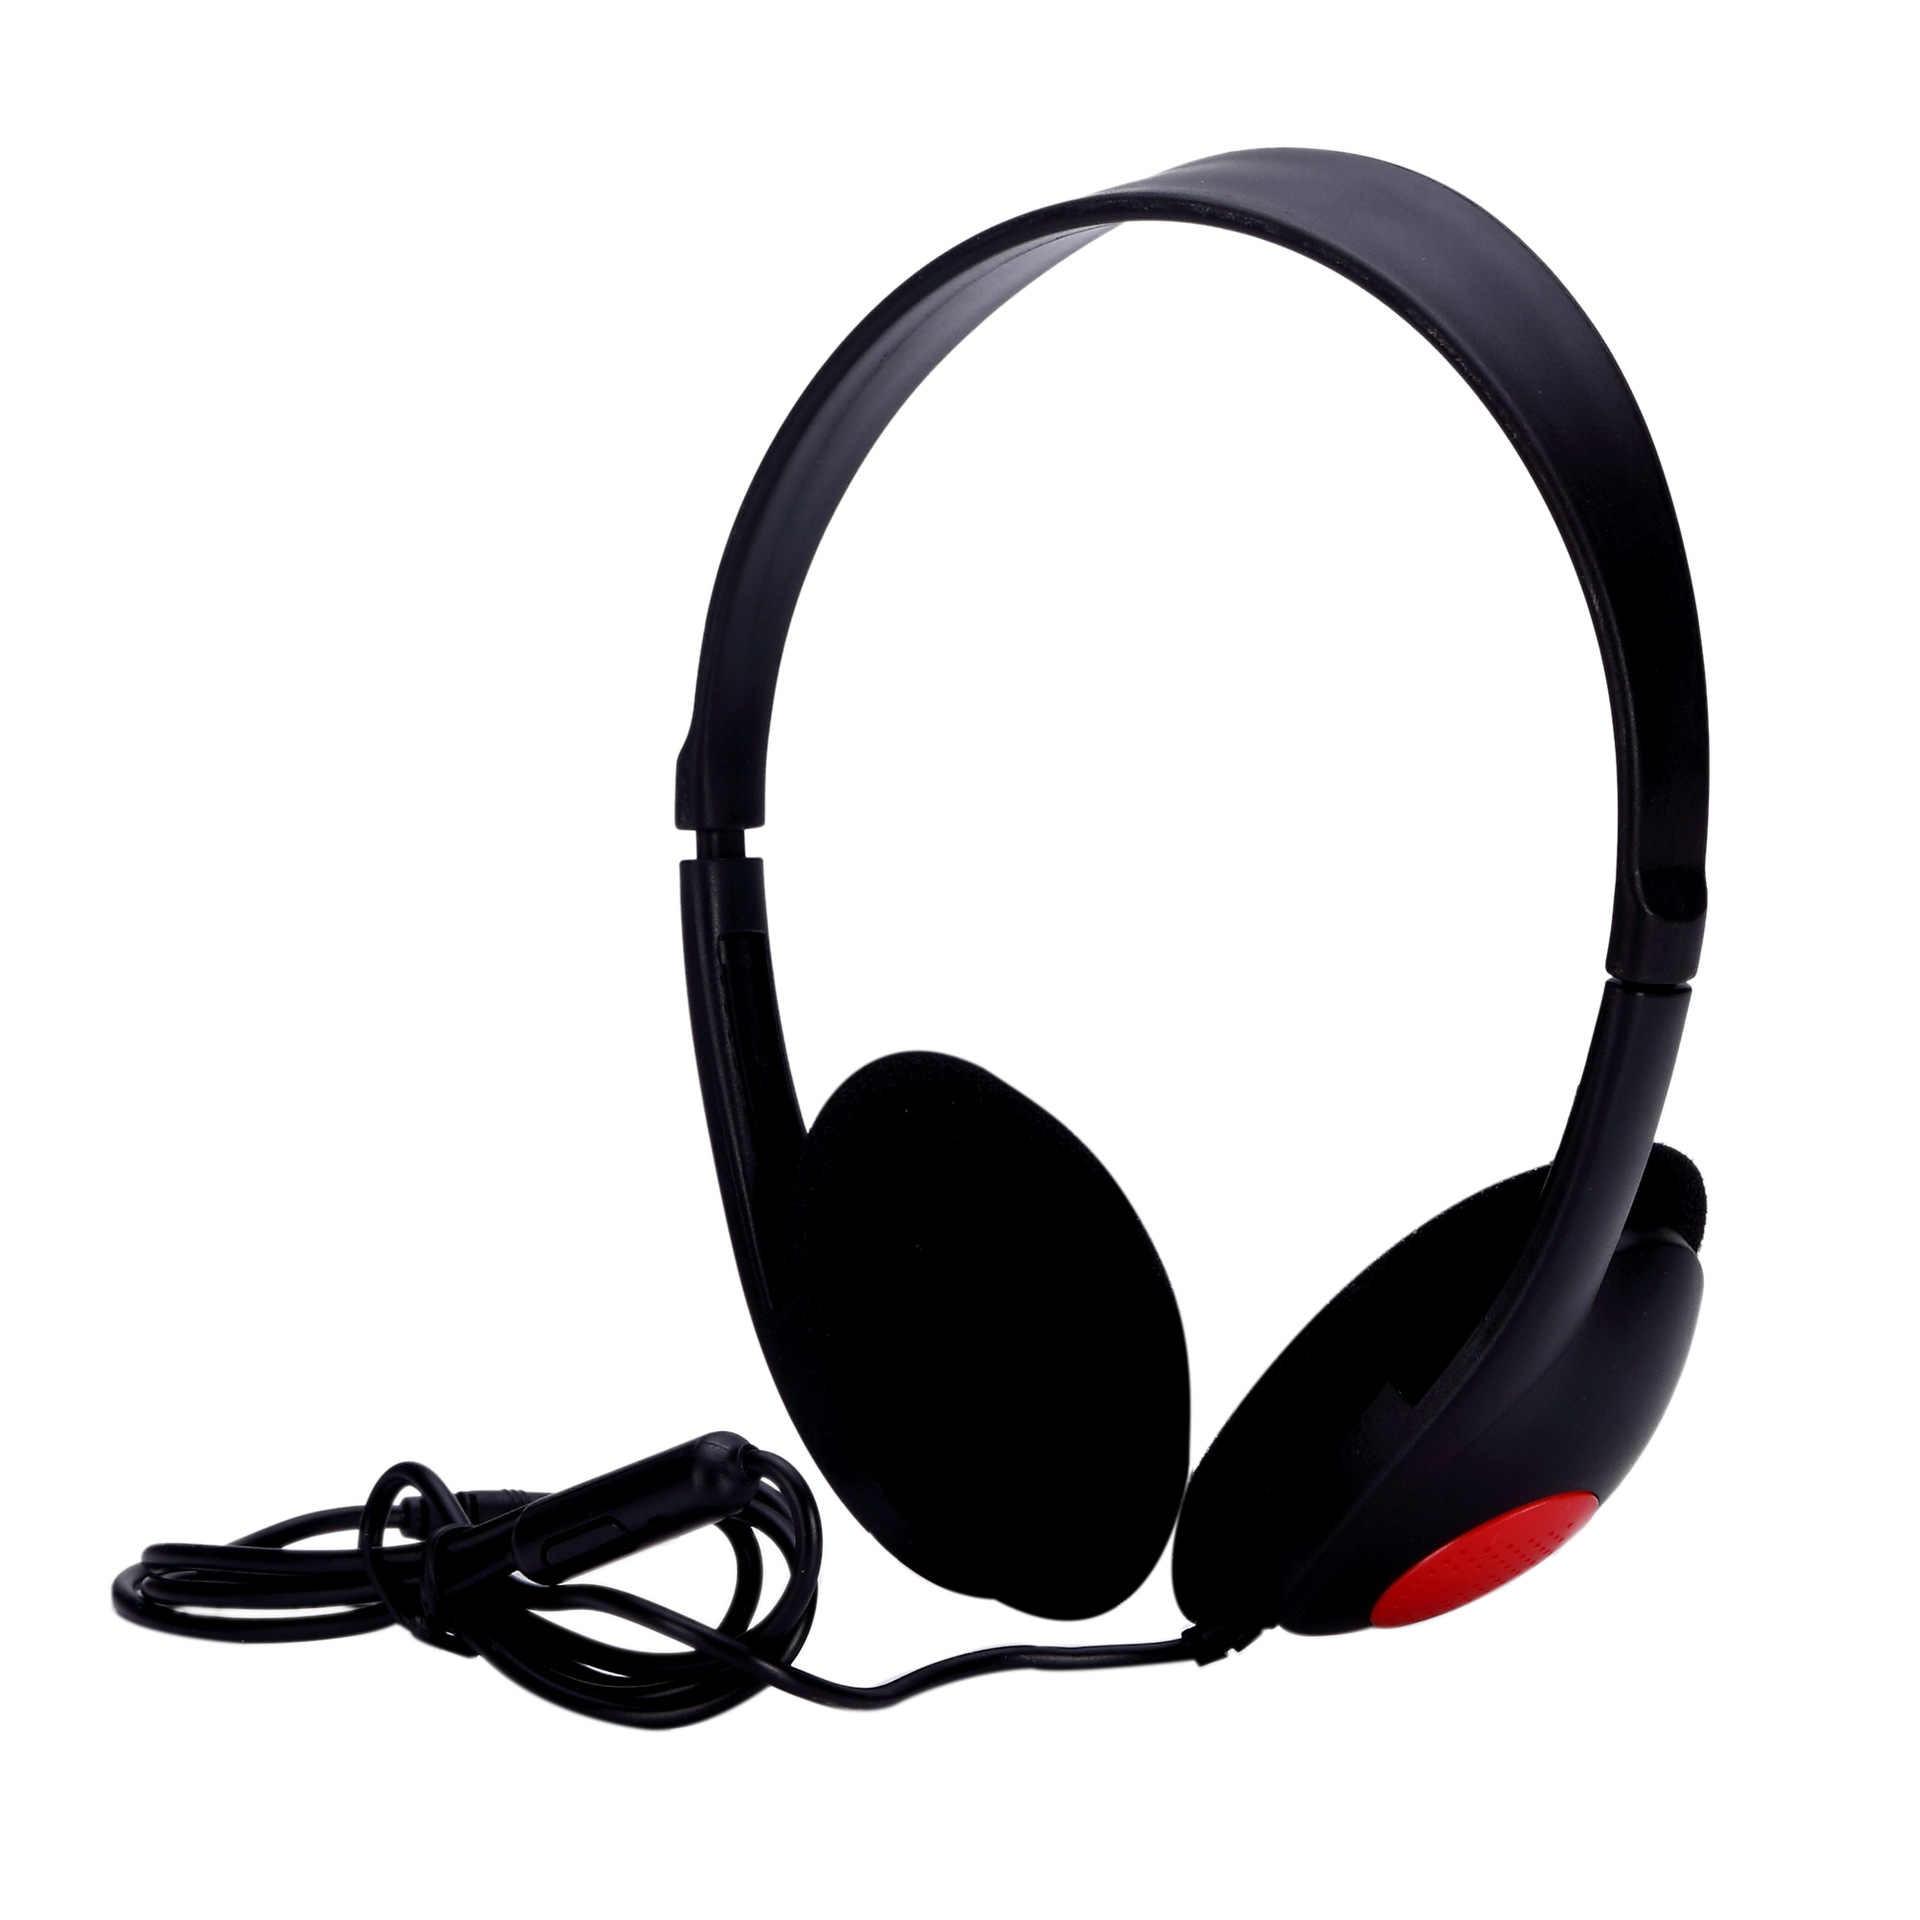 Yulass イヤホン有線白遮音ノイズキャンセル大ヘッドホンメンズ · レディース · 電話オーバーヘッドのためのビデオゲーム